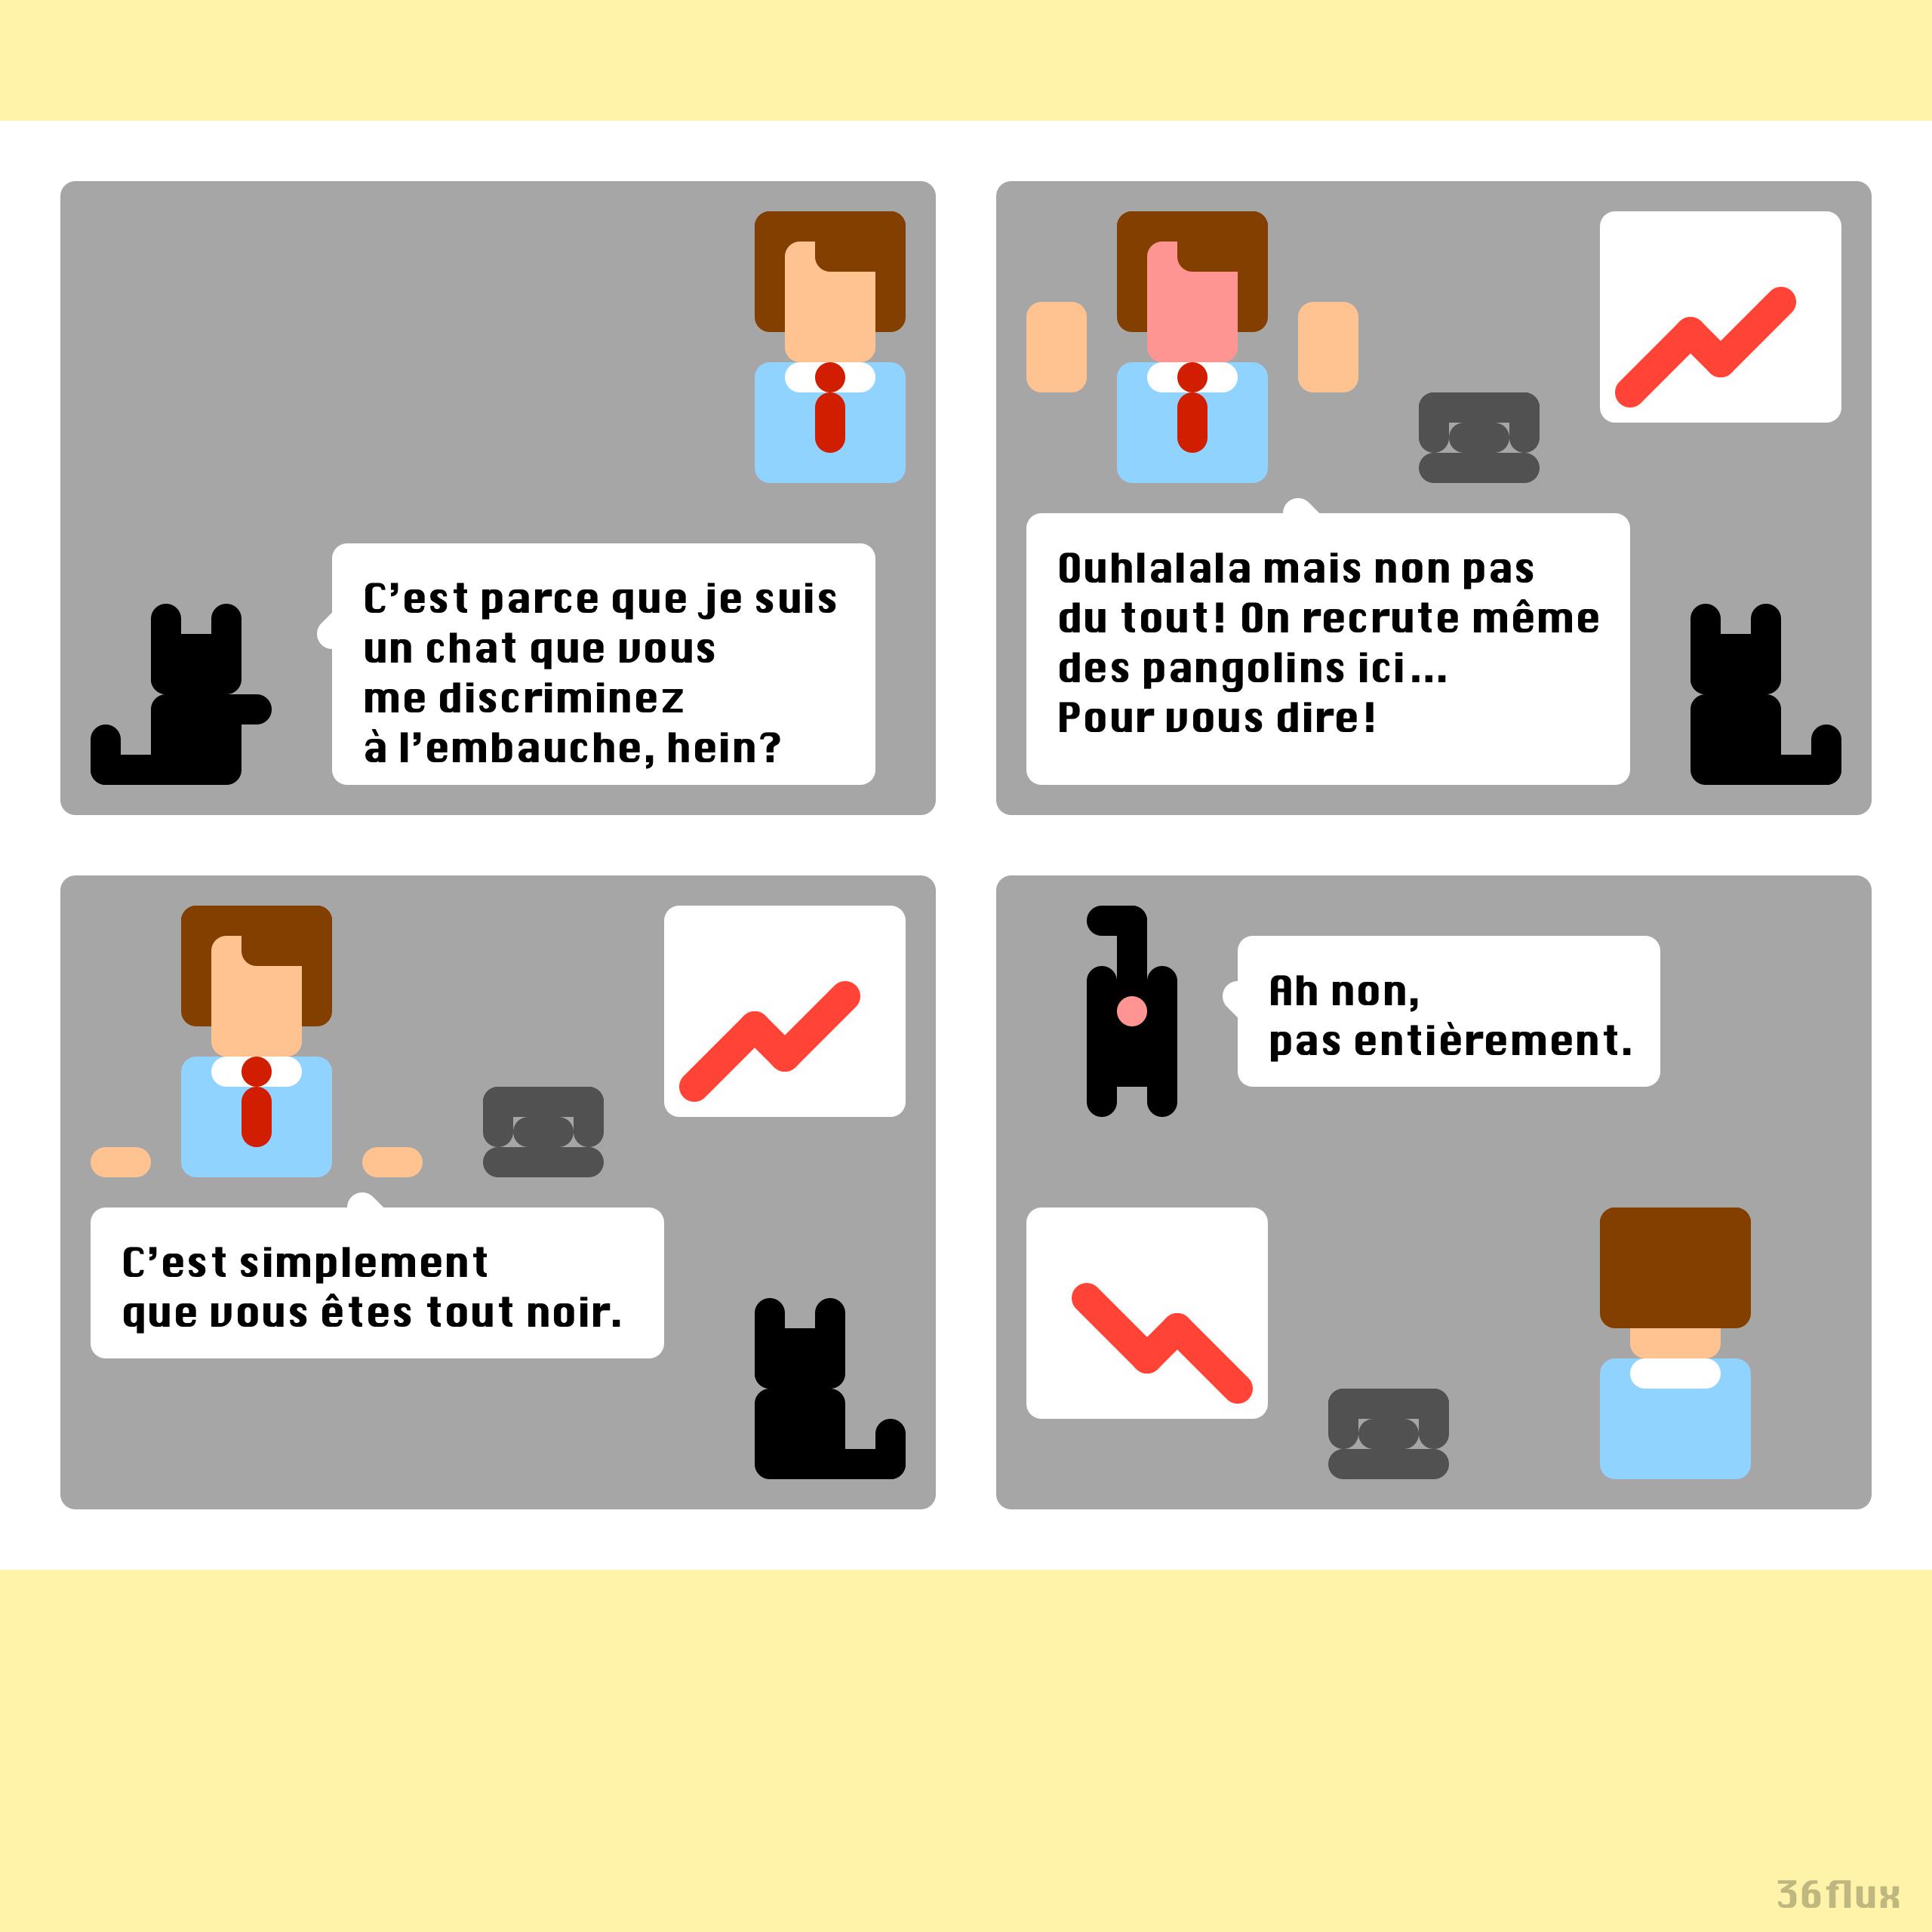 webcomics entretien d'embauche, discrimination